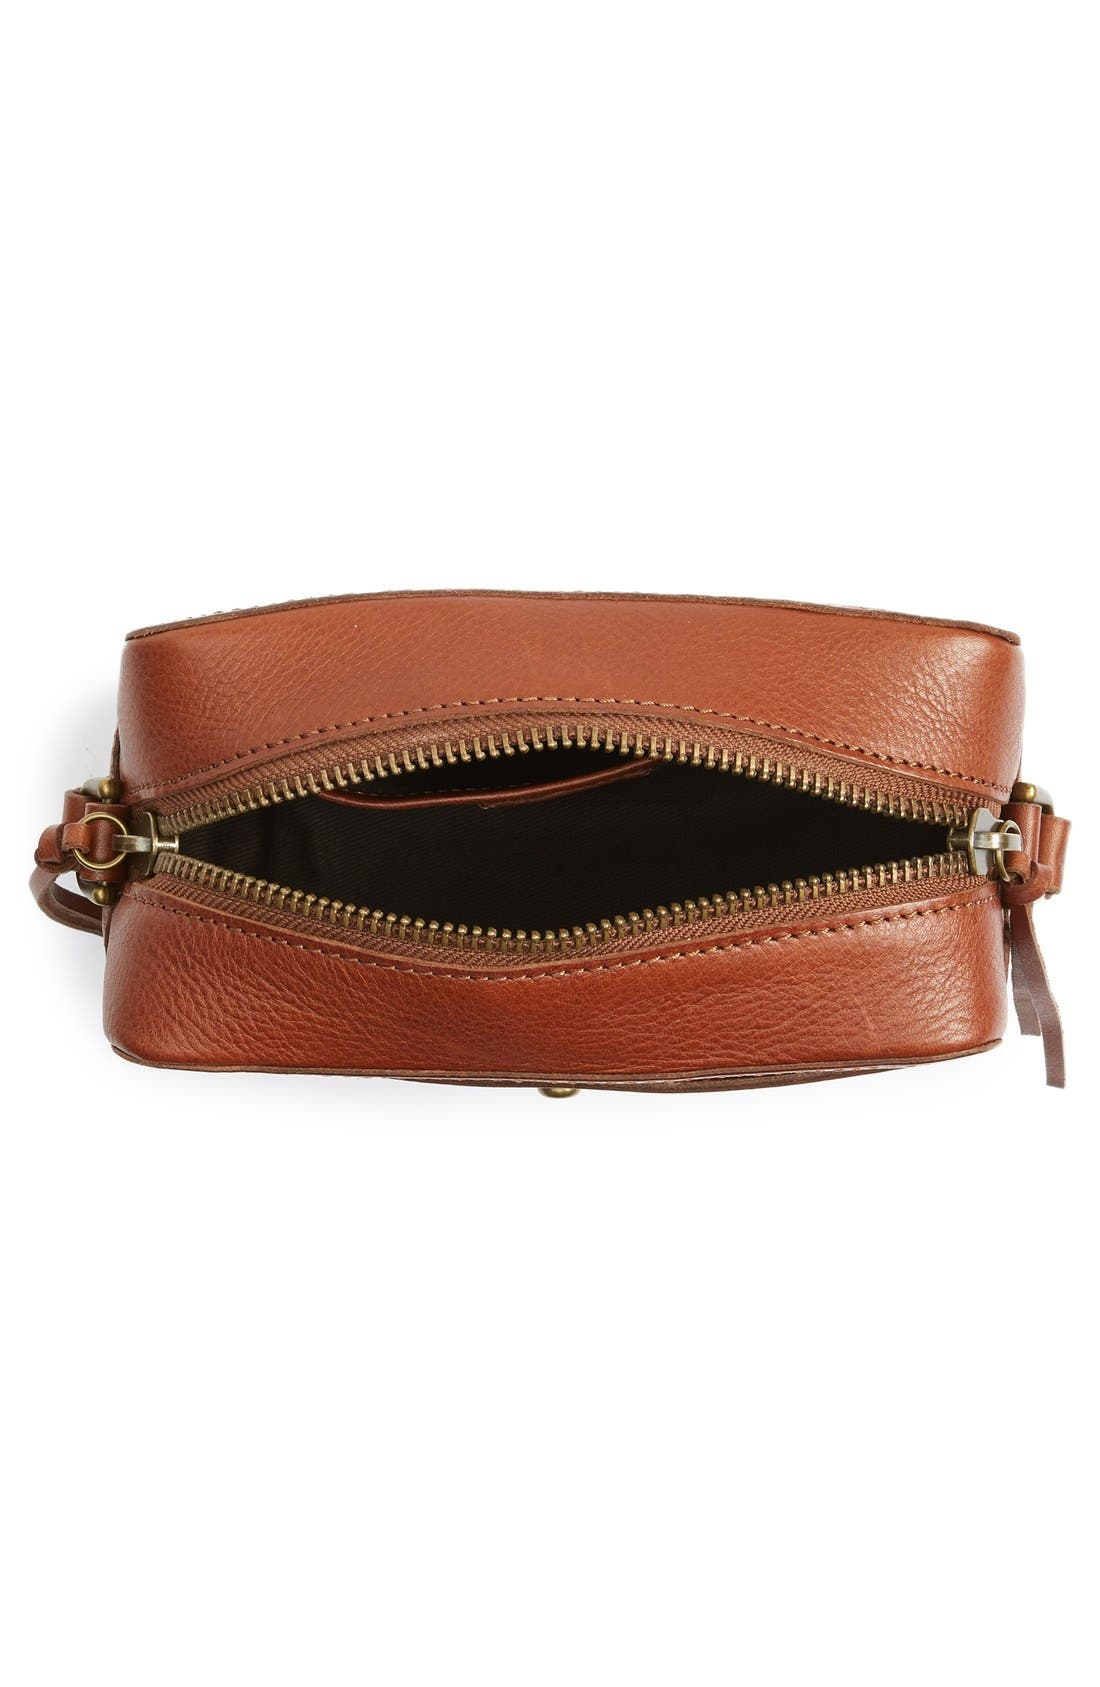 Leather Camera Bag,                             Alternate thumbnail 5, color,                             200